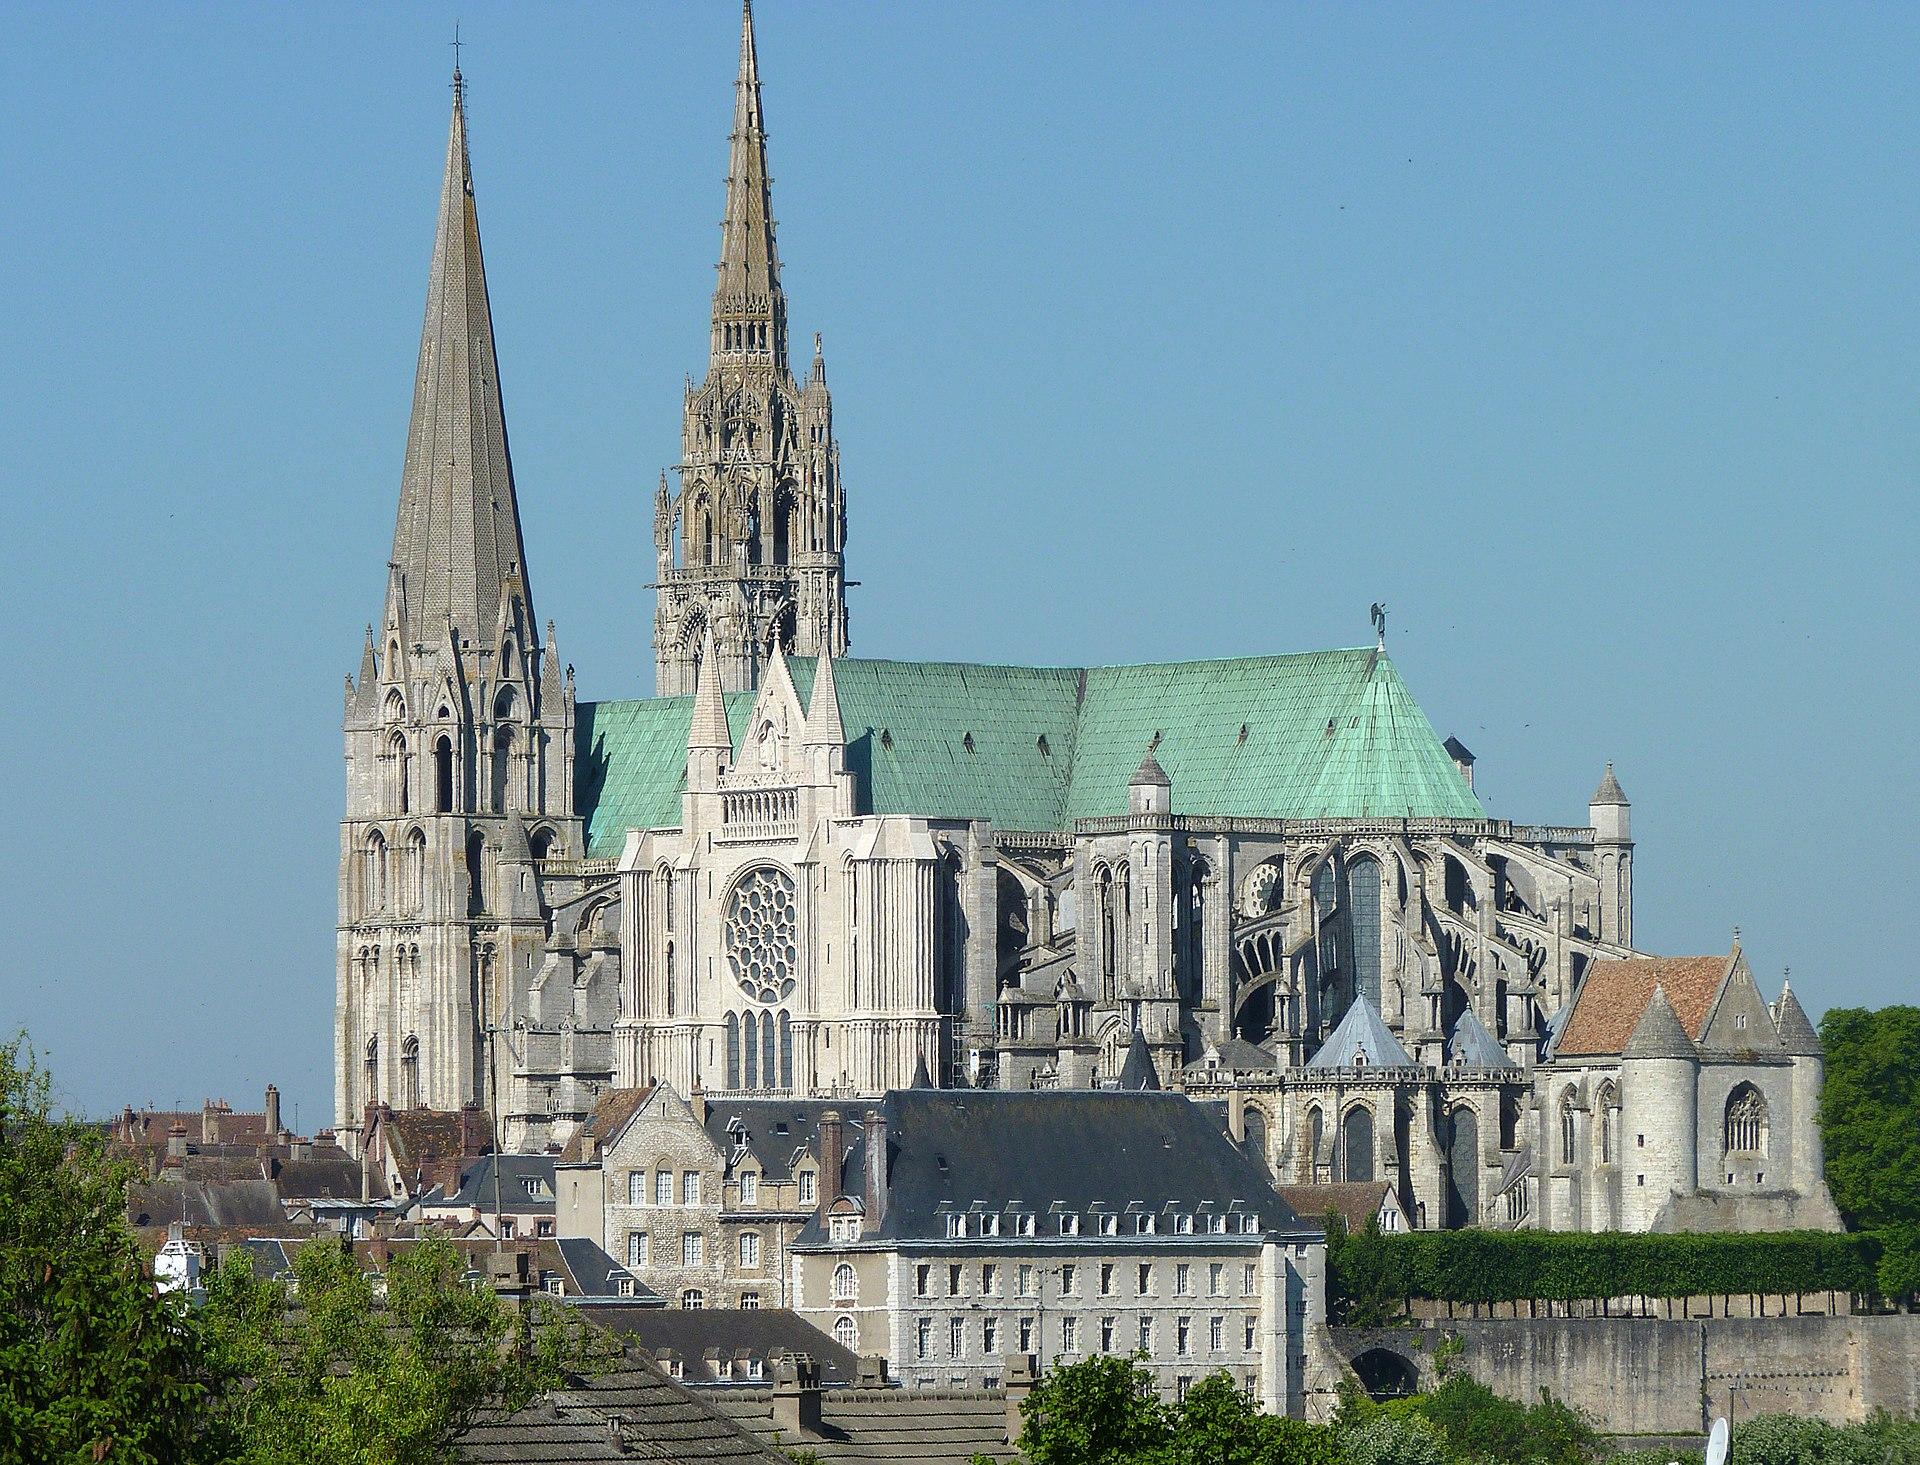 https://upload.wikimedia.org/wikipedia/commons/thumb/2/28/Notre_Dame_de_Chartres.jpg/1920px-Notre_Dame_de_Chartres.jpg